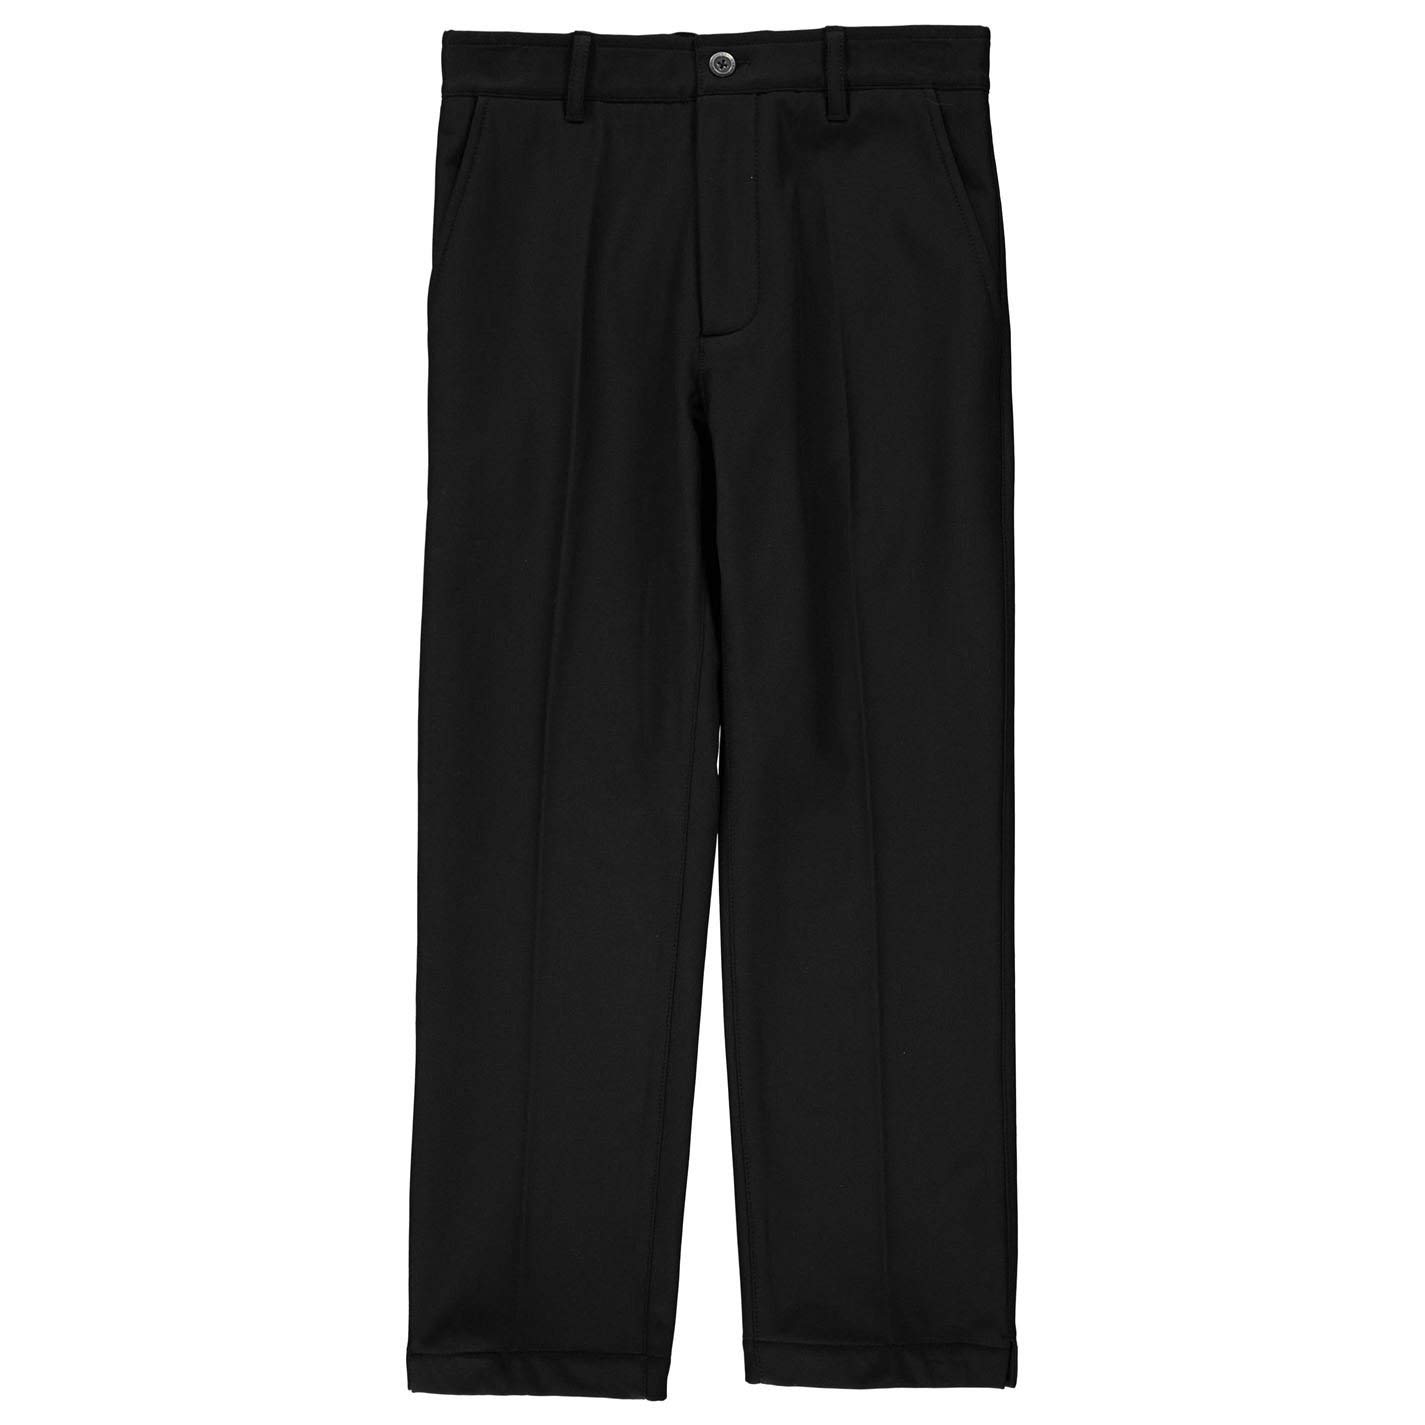 5ada982875 Get Quotations · Slazenger Kids Boys Winter Trousers Golf Pants Bottoms Zip